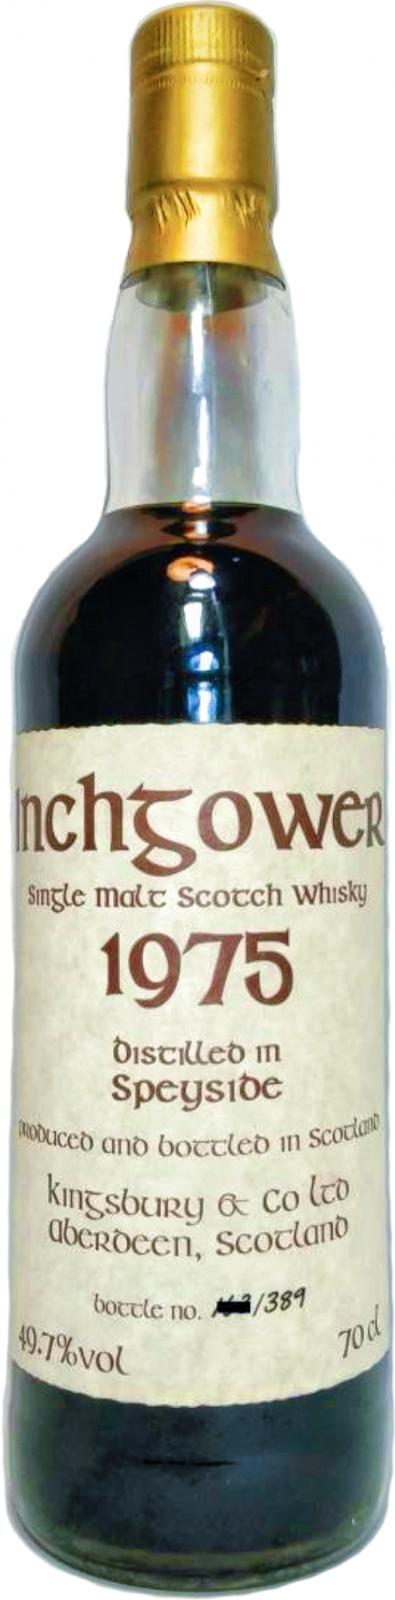 Inchgower 1975 Kb